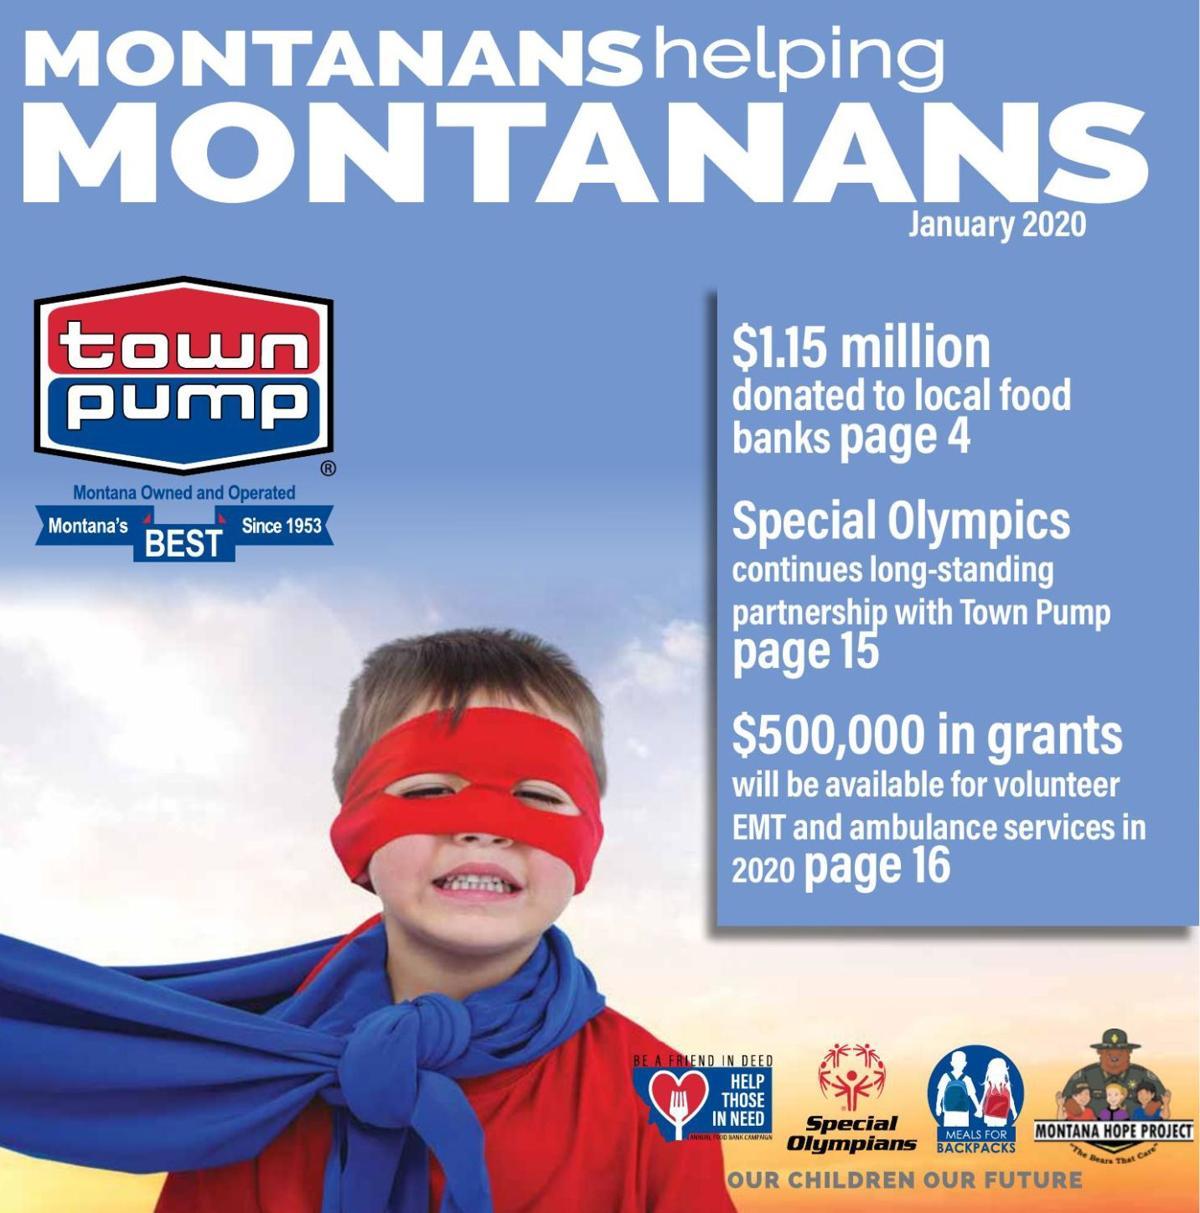 Town Pump Charitable Foundation